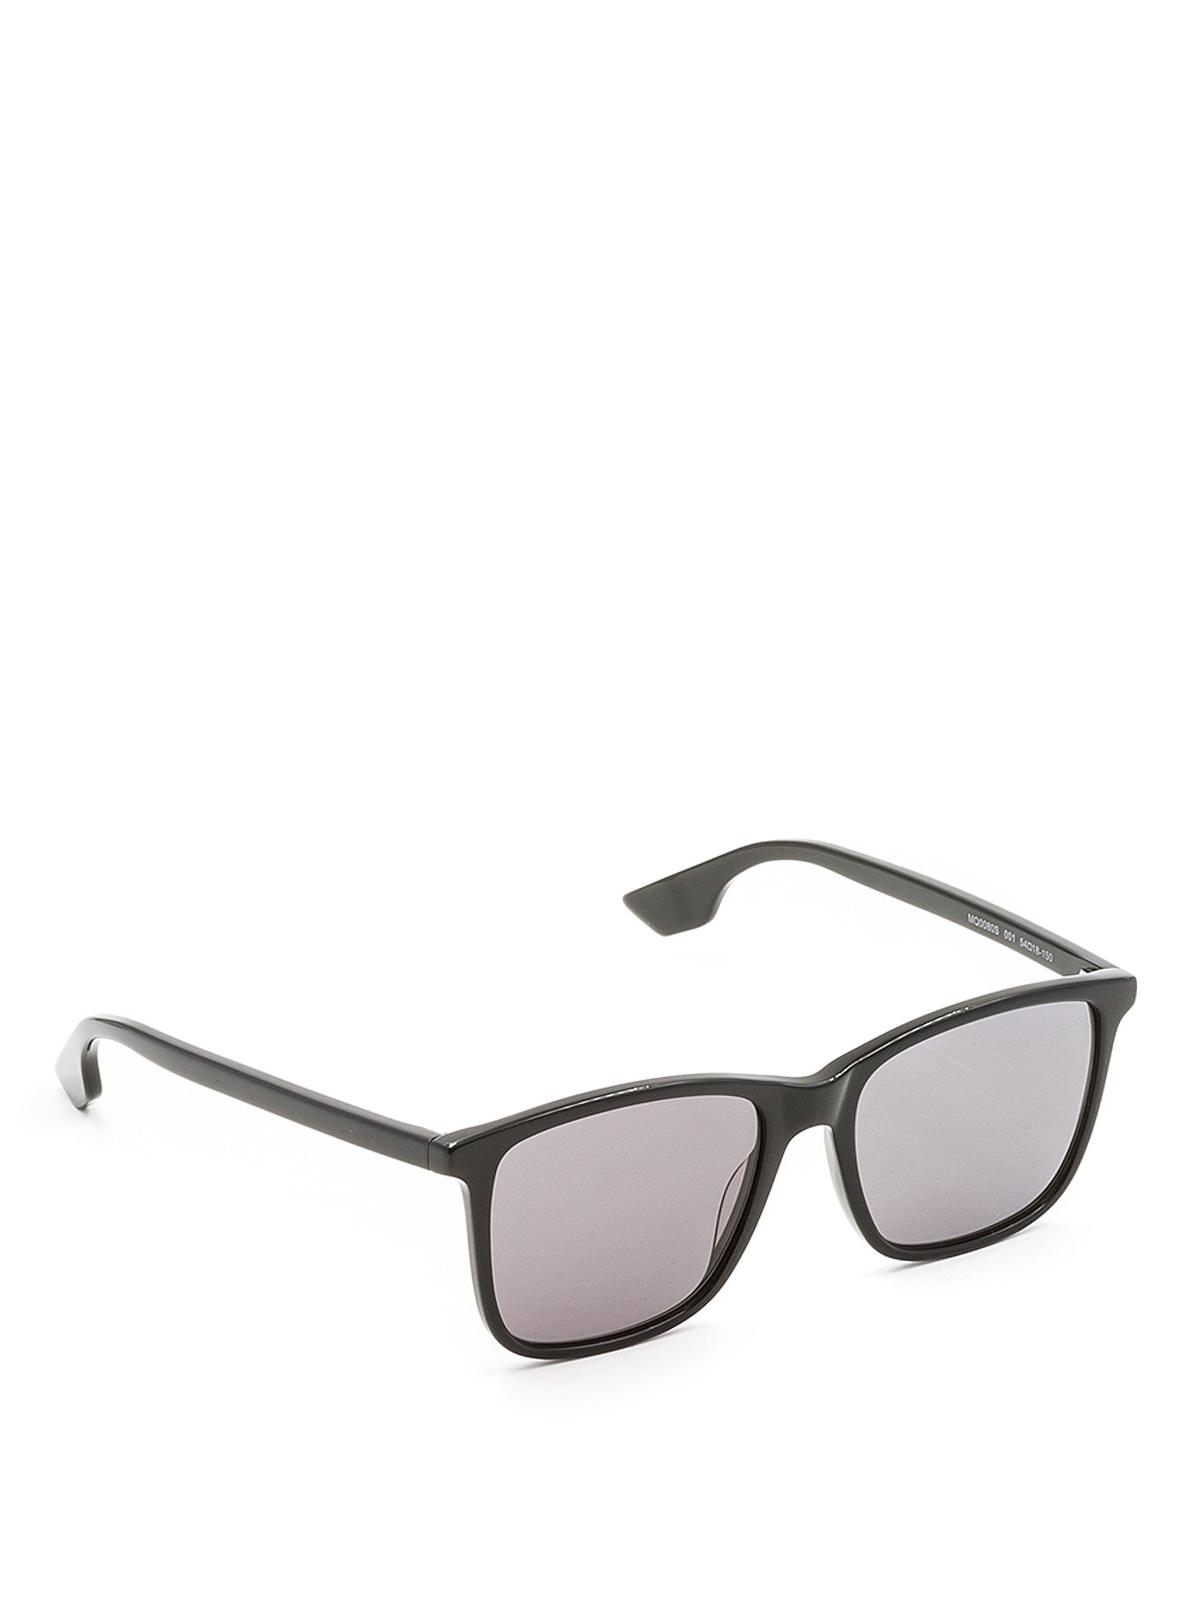 Occhiali da sole neri quadrati mcq occhiali da sole ikrix for Occhiali neri da sole